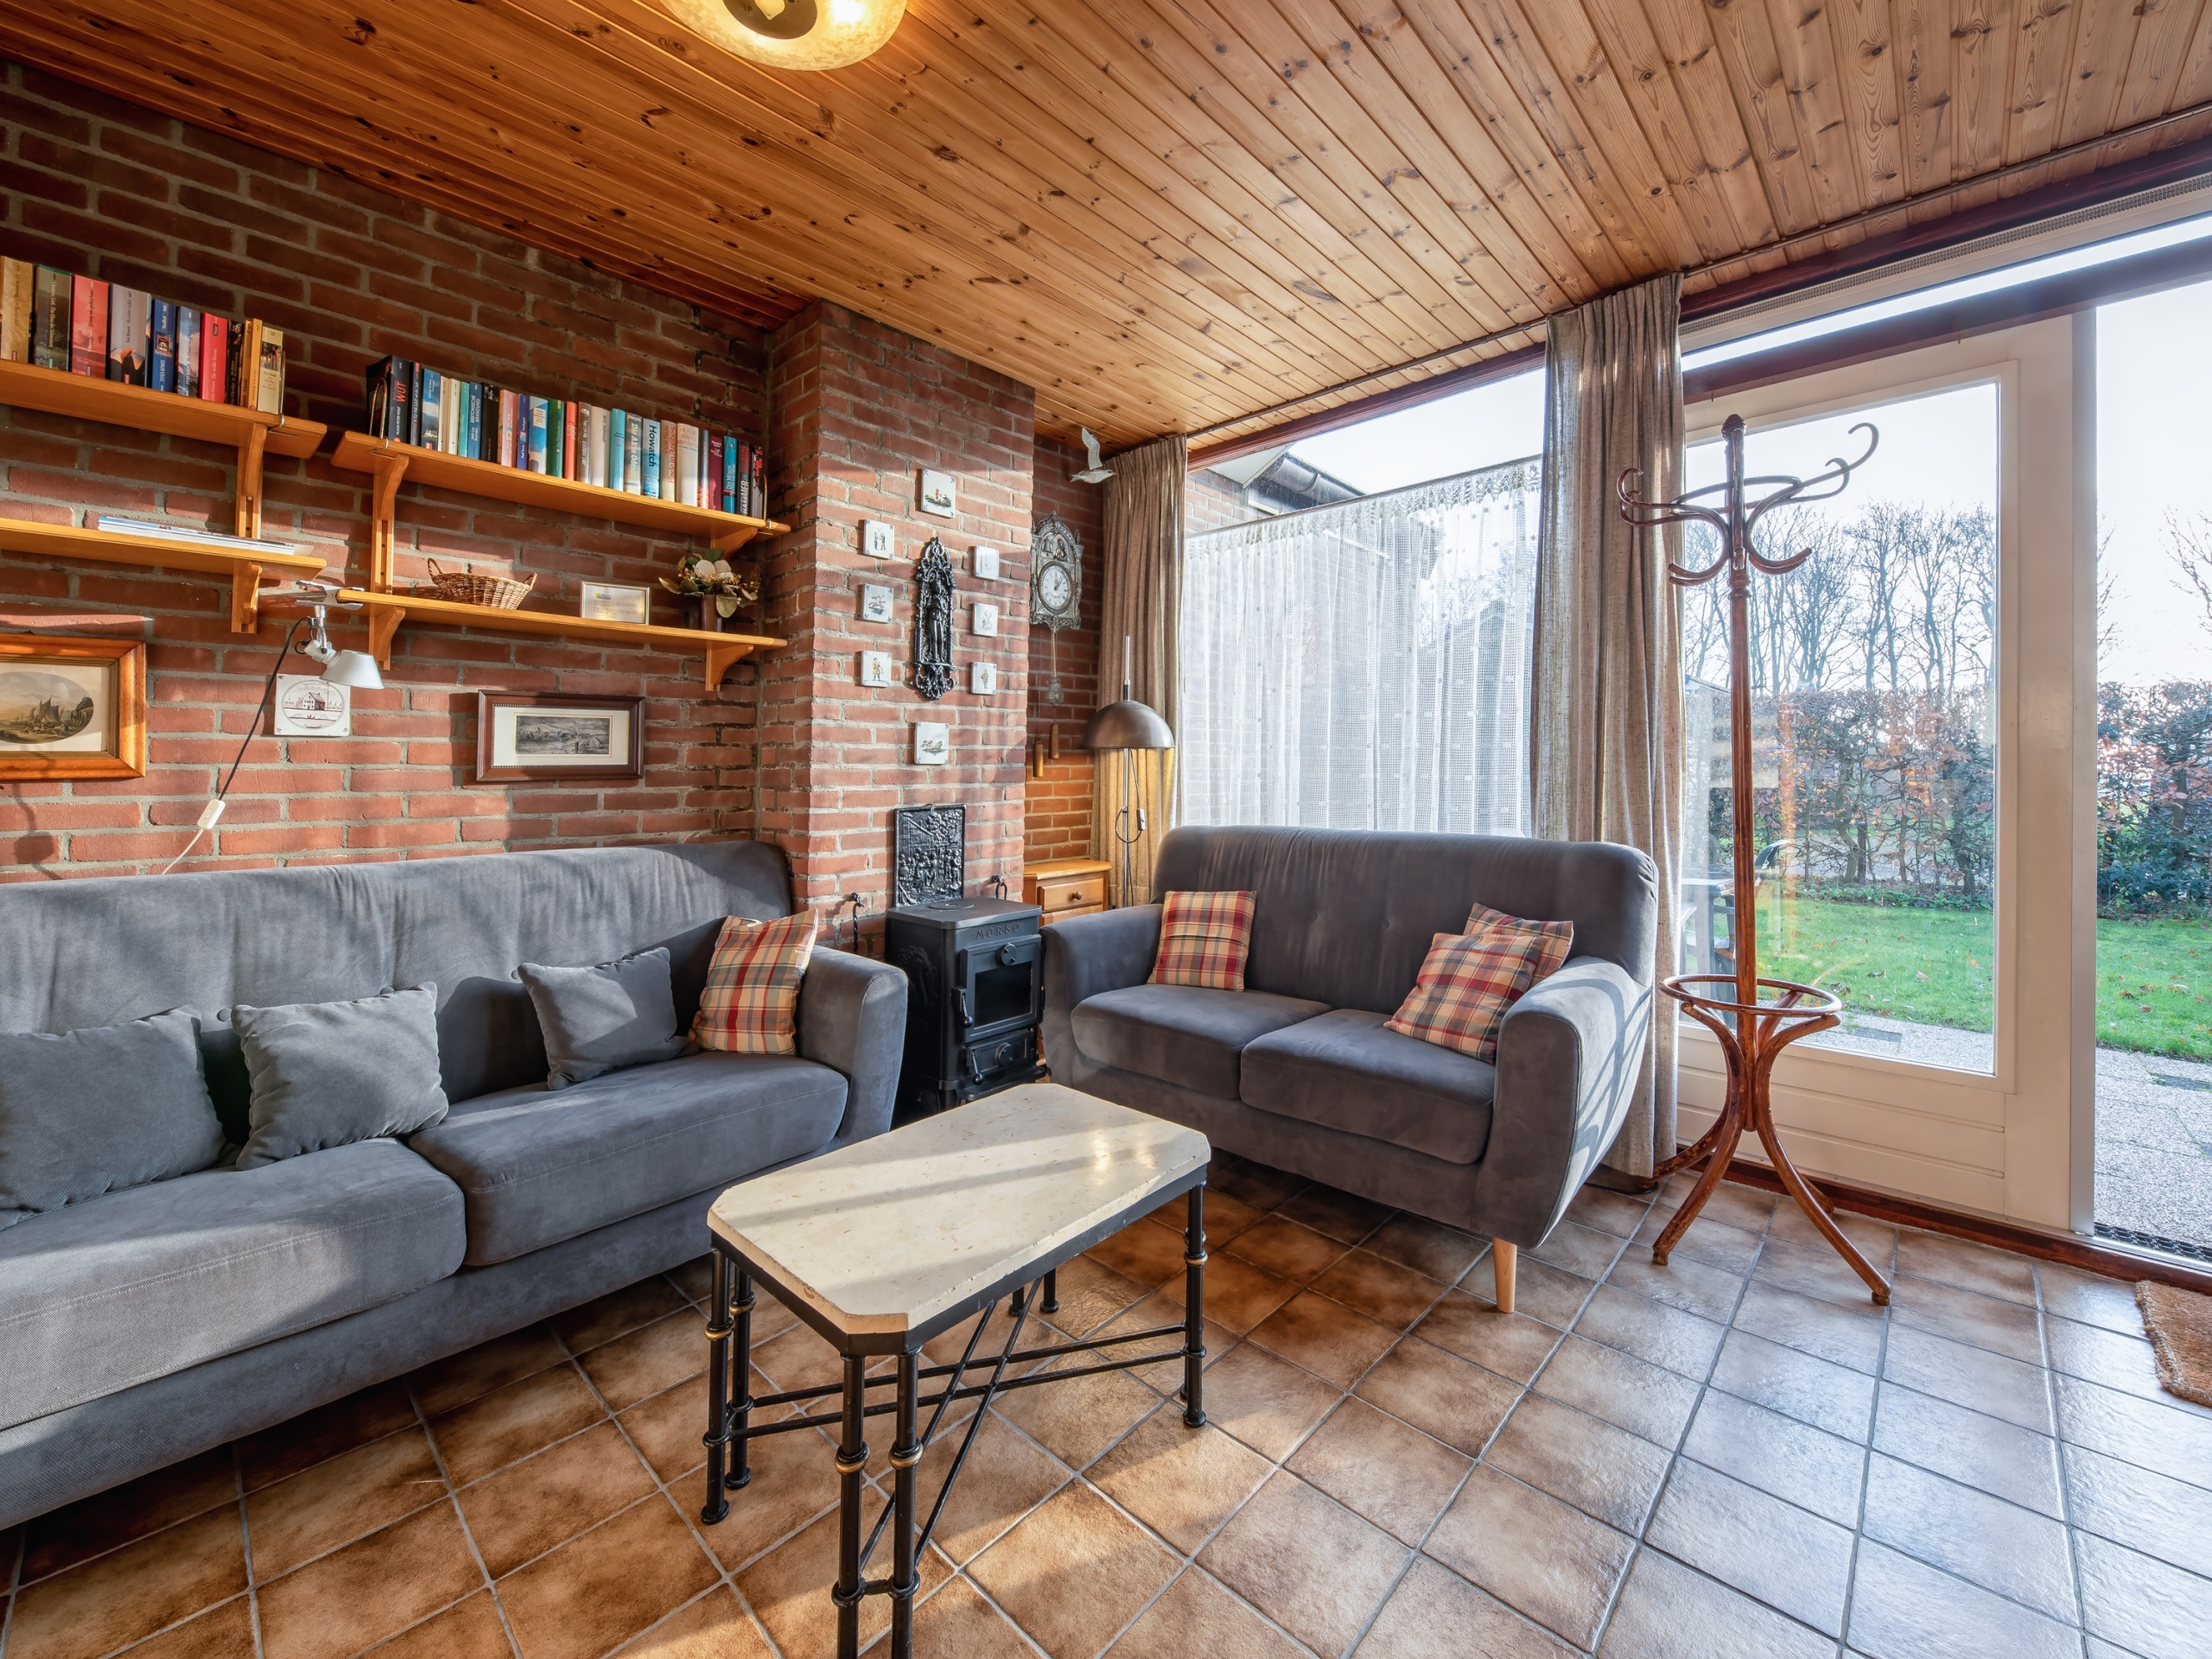 Pet-free holiday home near De Slufter and polders